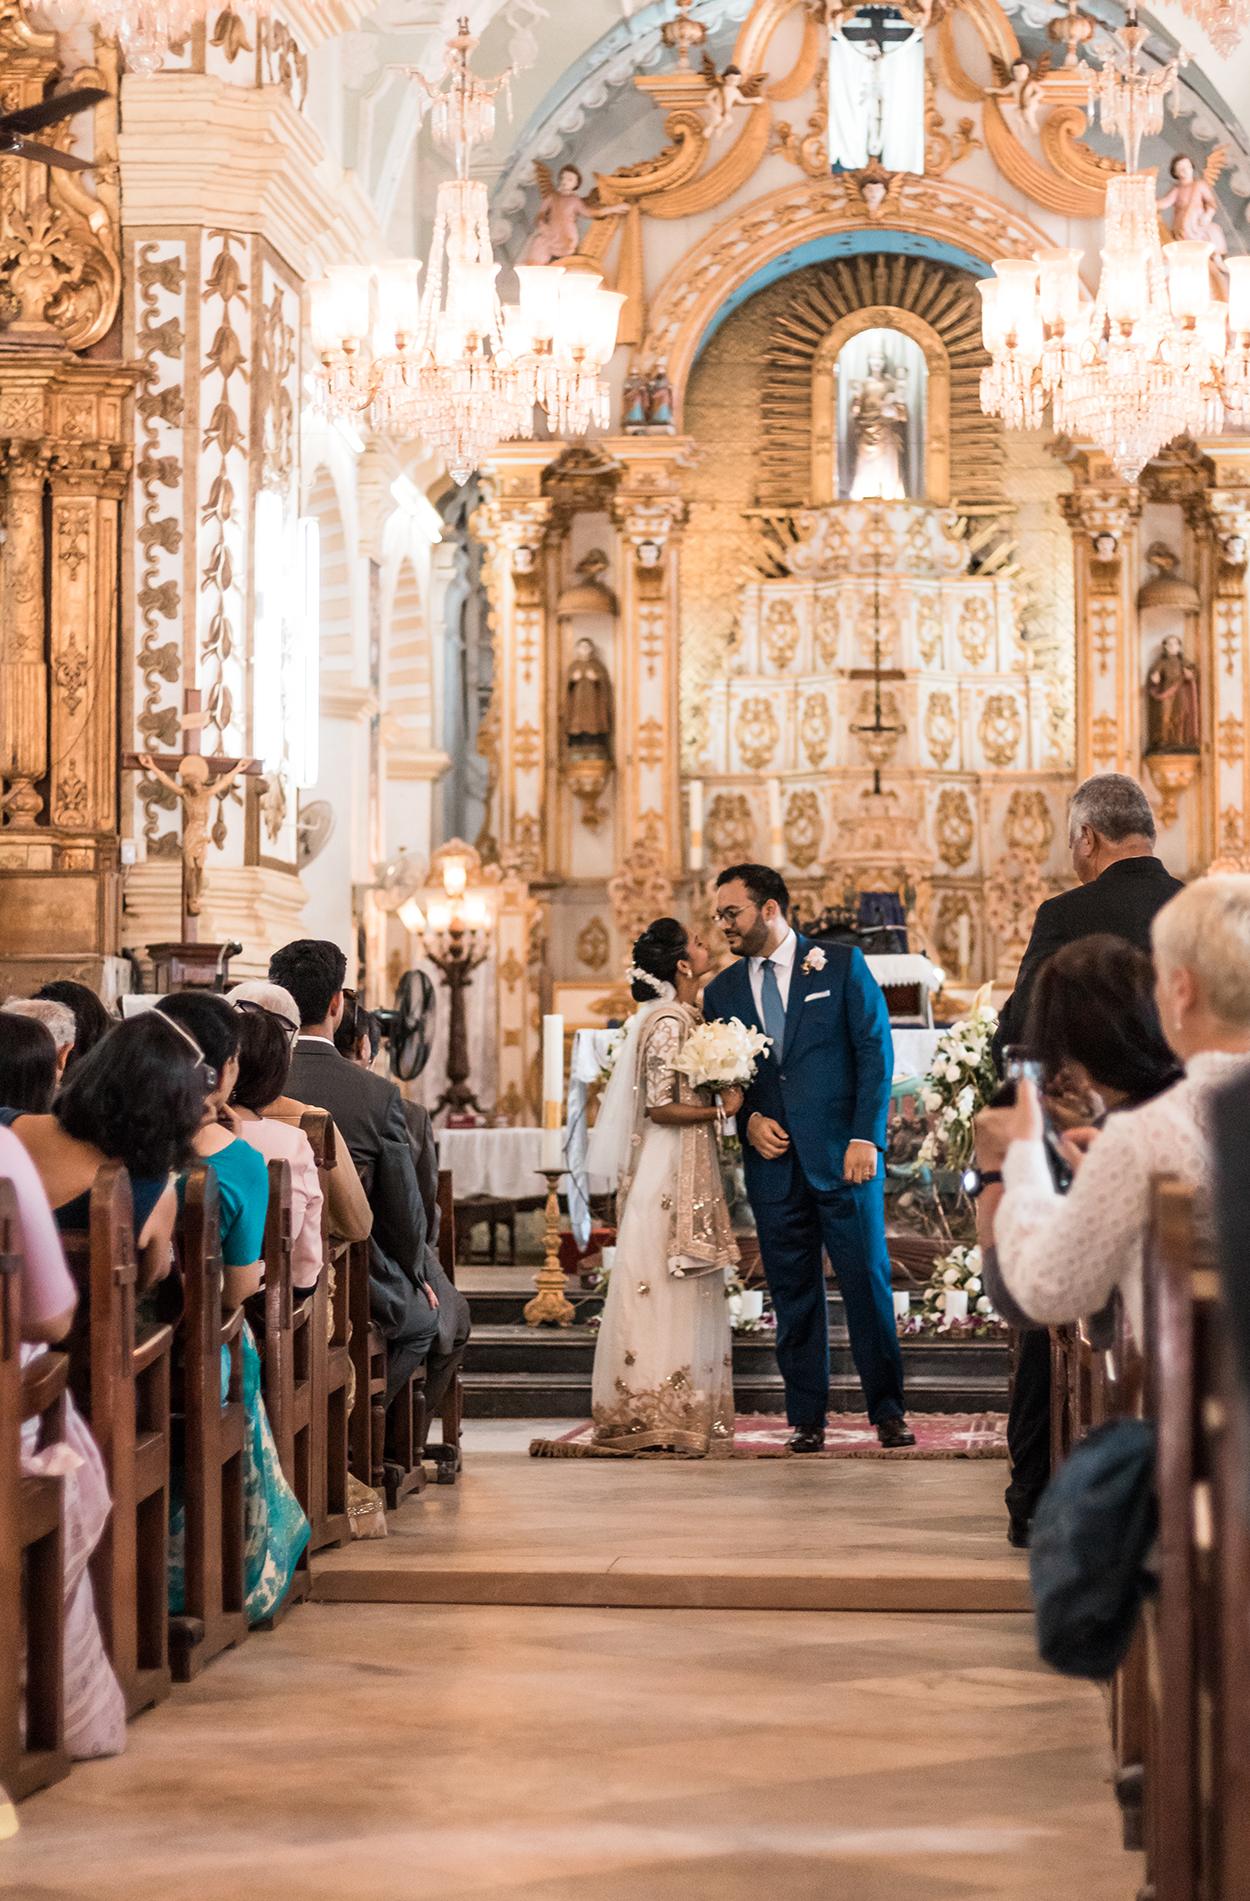 boda-hindu-indian-wedding-saree-goa-sageet-11